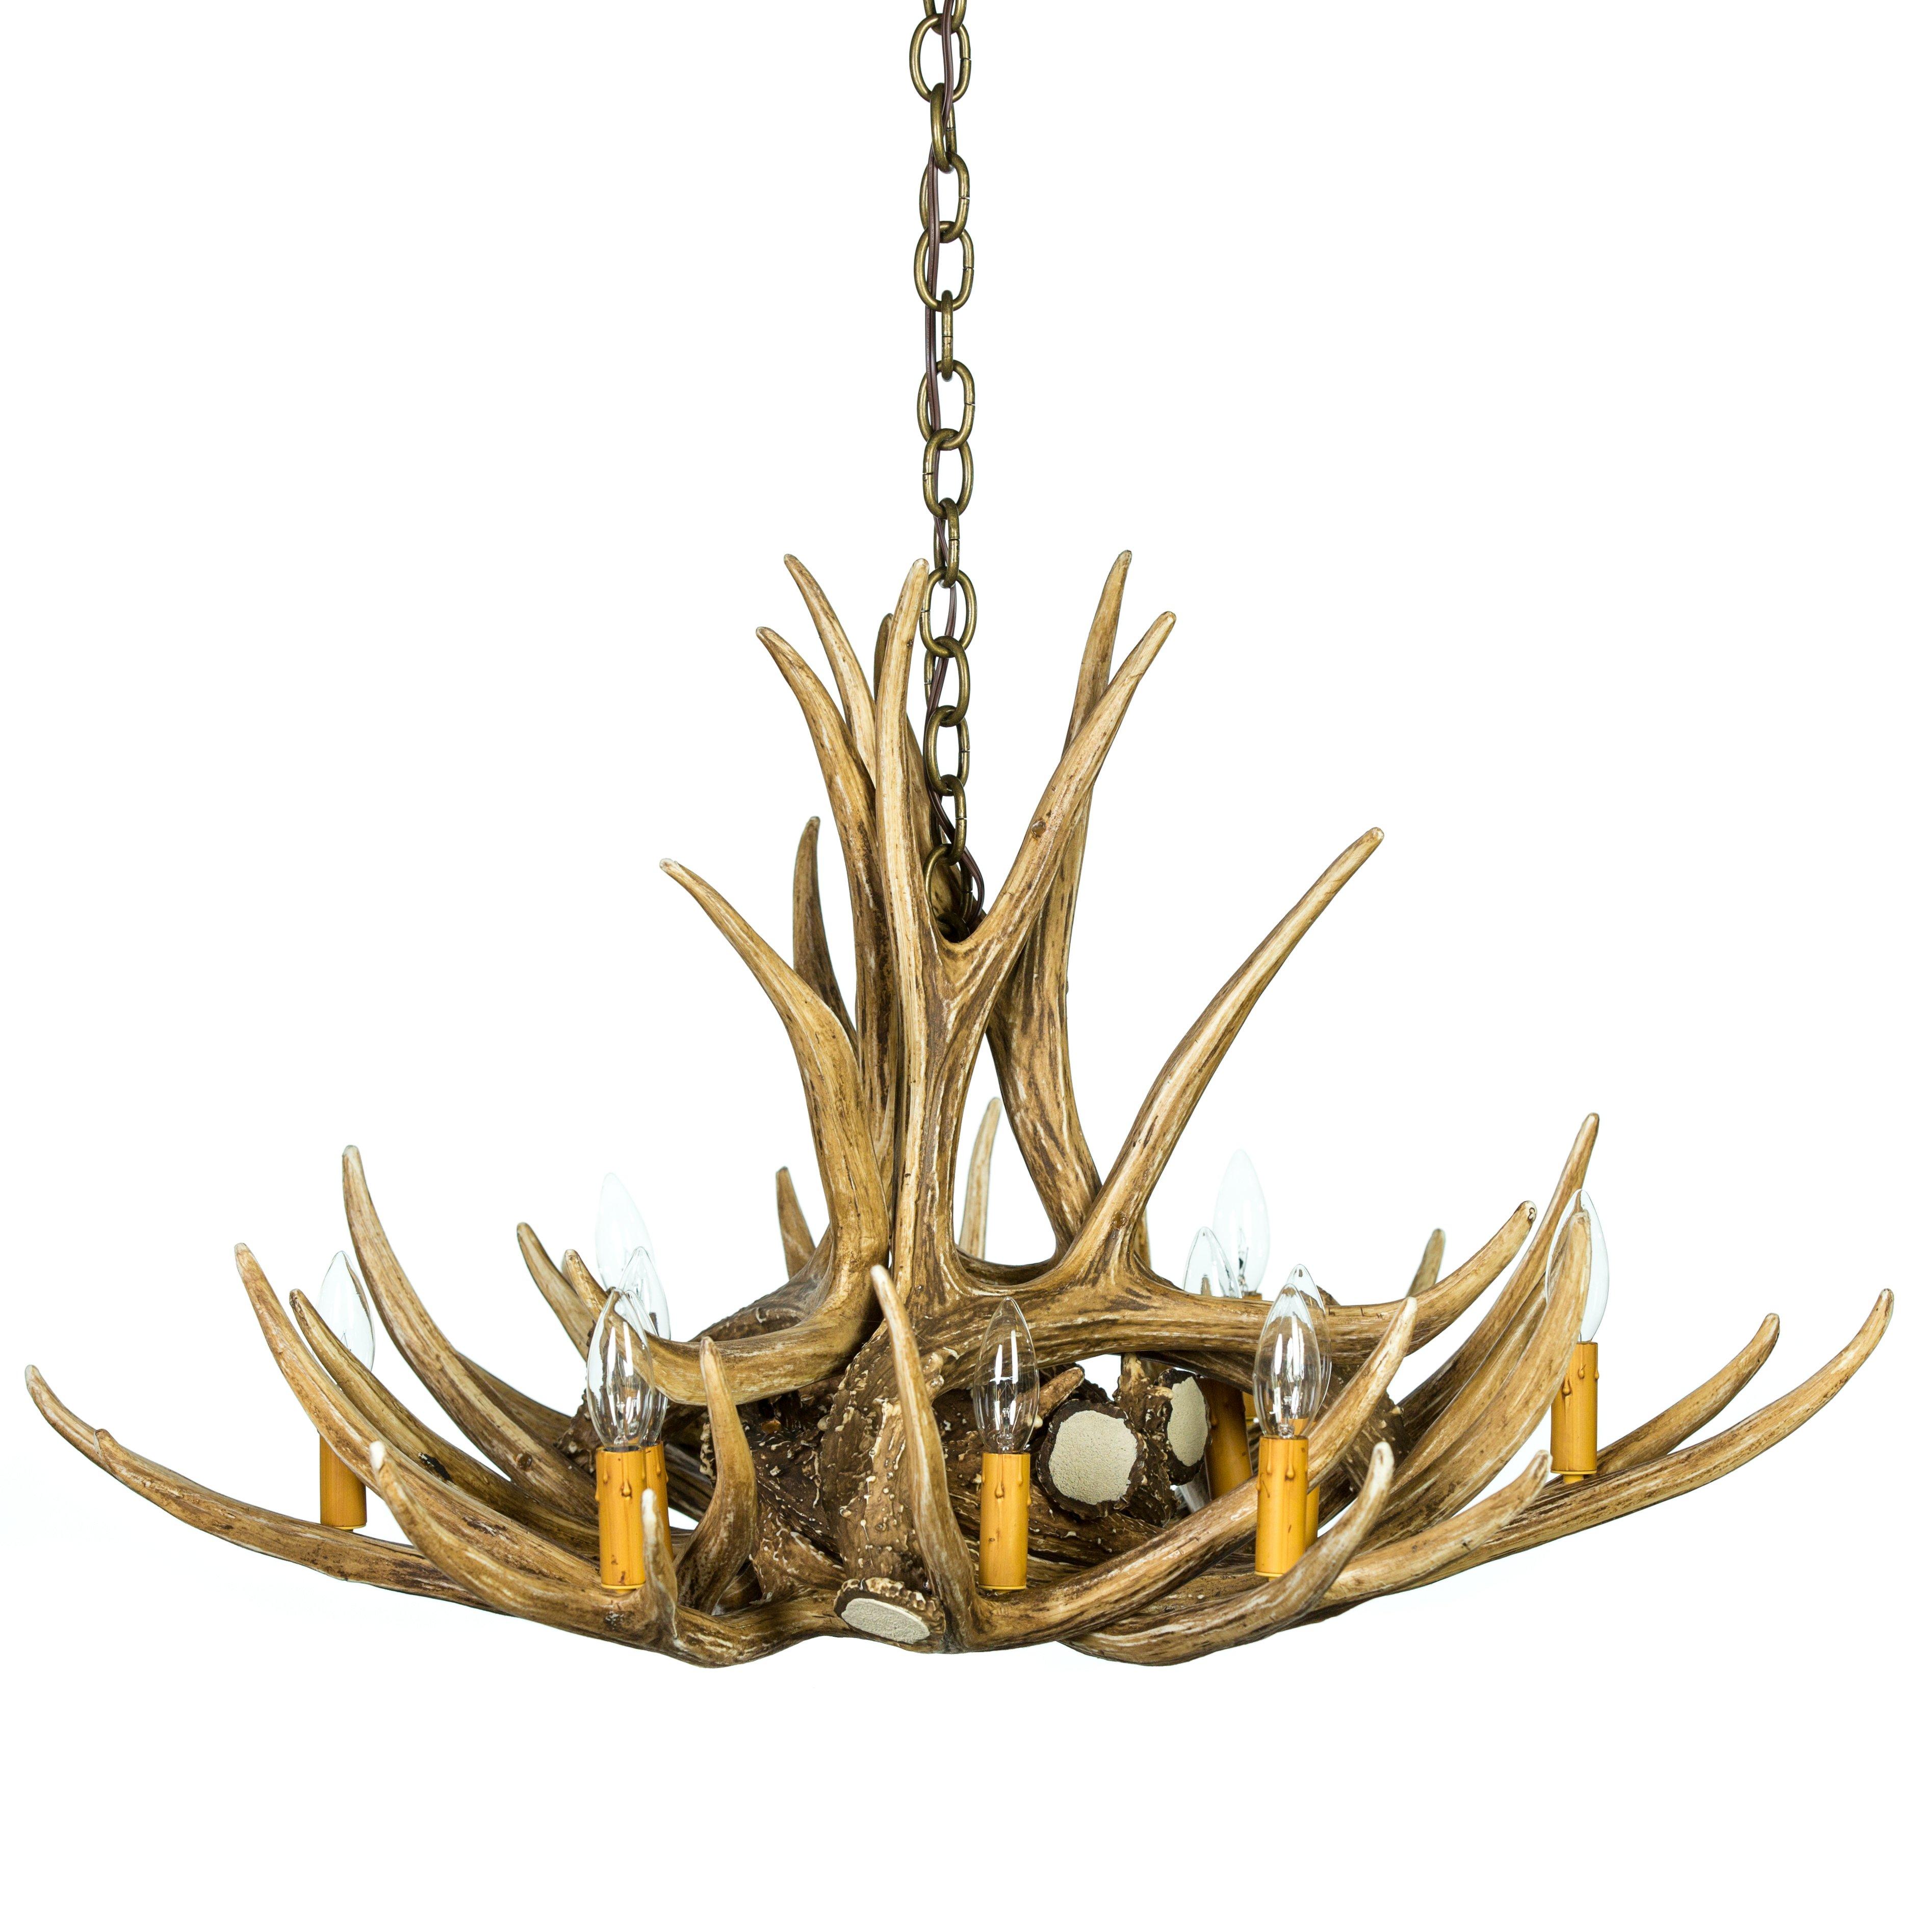 Mule deer 9 antler chandelier cast horn designs mule deer 9 antler chandelier aloadofball Choice Image